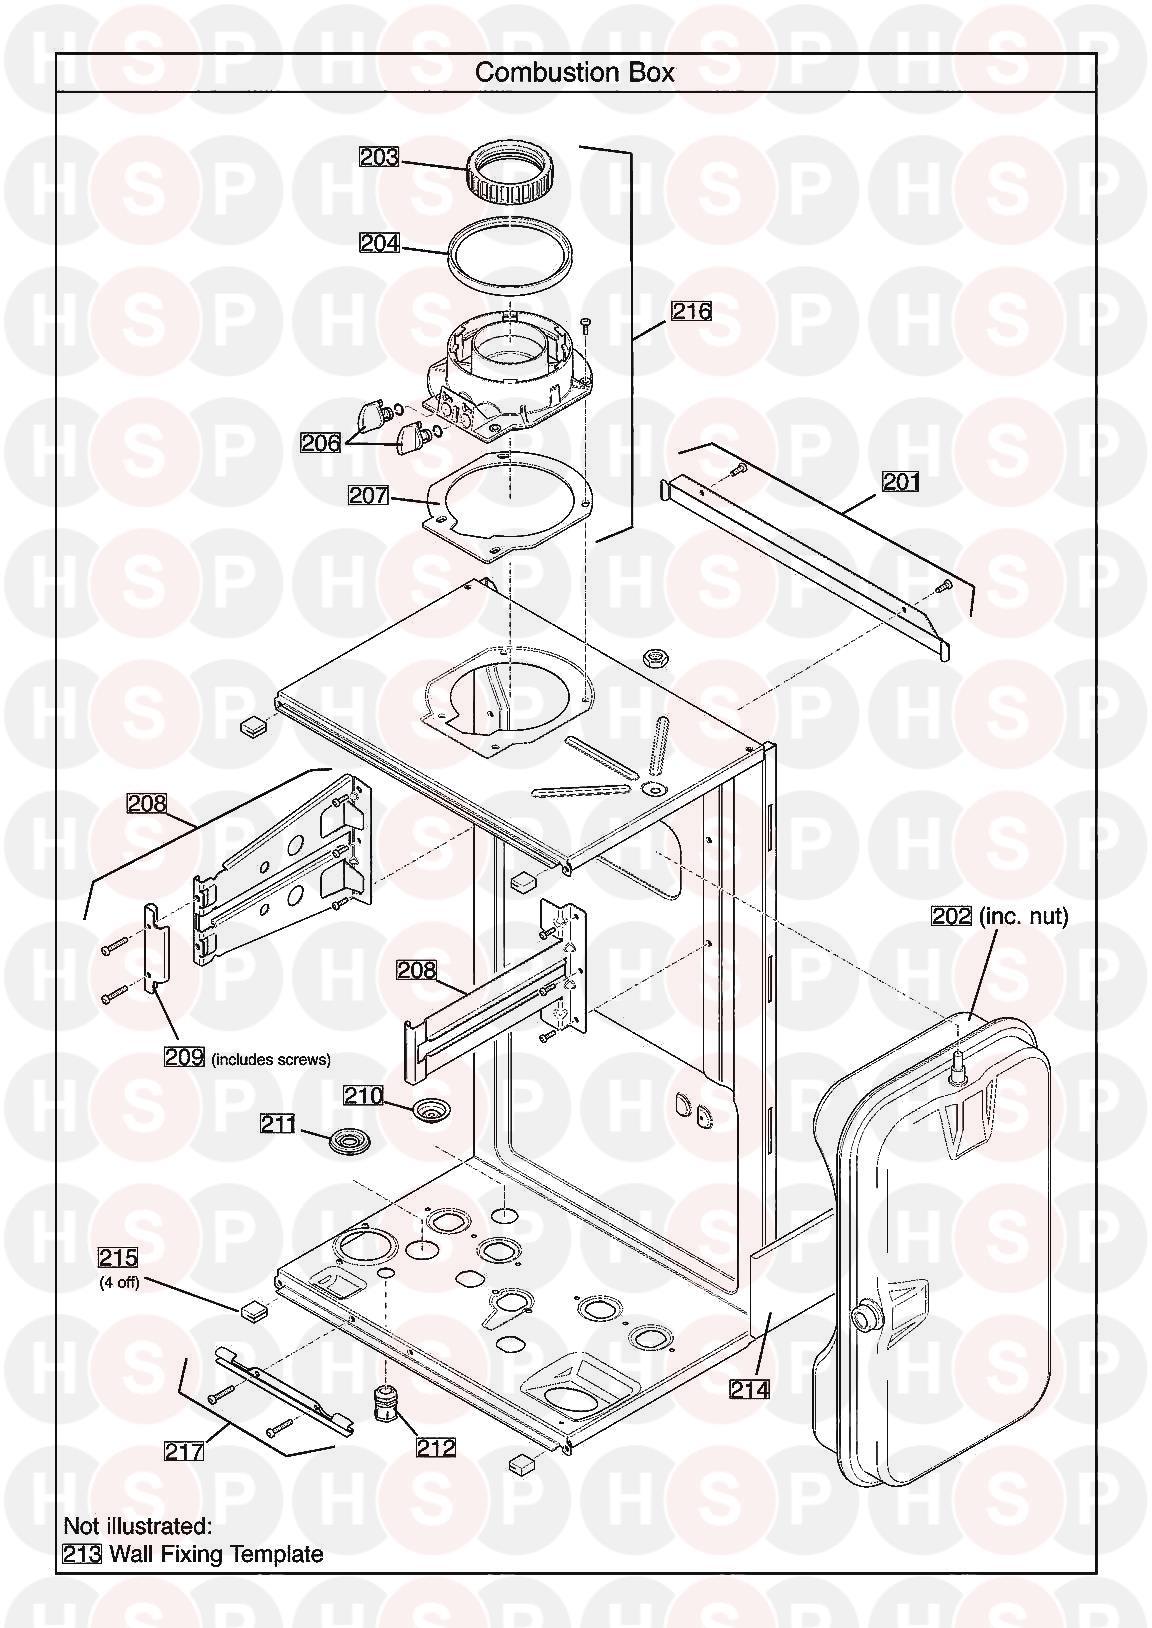 baxi megaflo 2 system 18 compact ga  combustion box  diagram